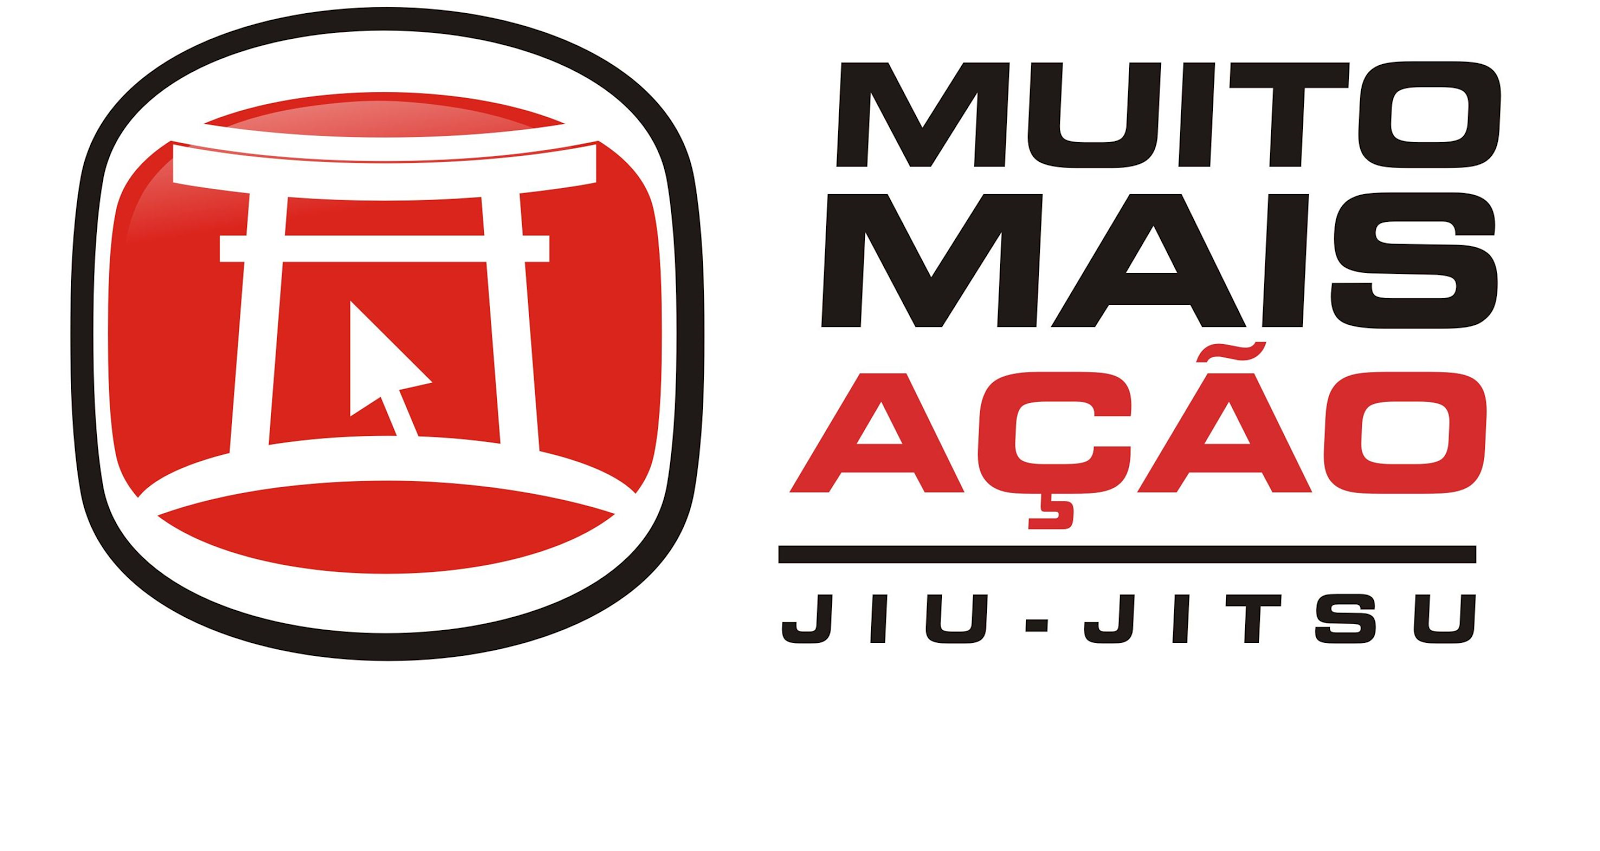 MMA Jiu-Jitsu - Dicas, Técnicas, Golpes, Vídeos sobre Jiu Jitsu!